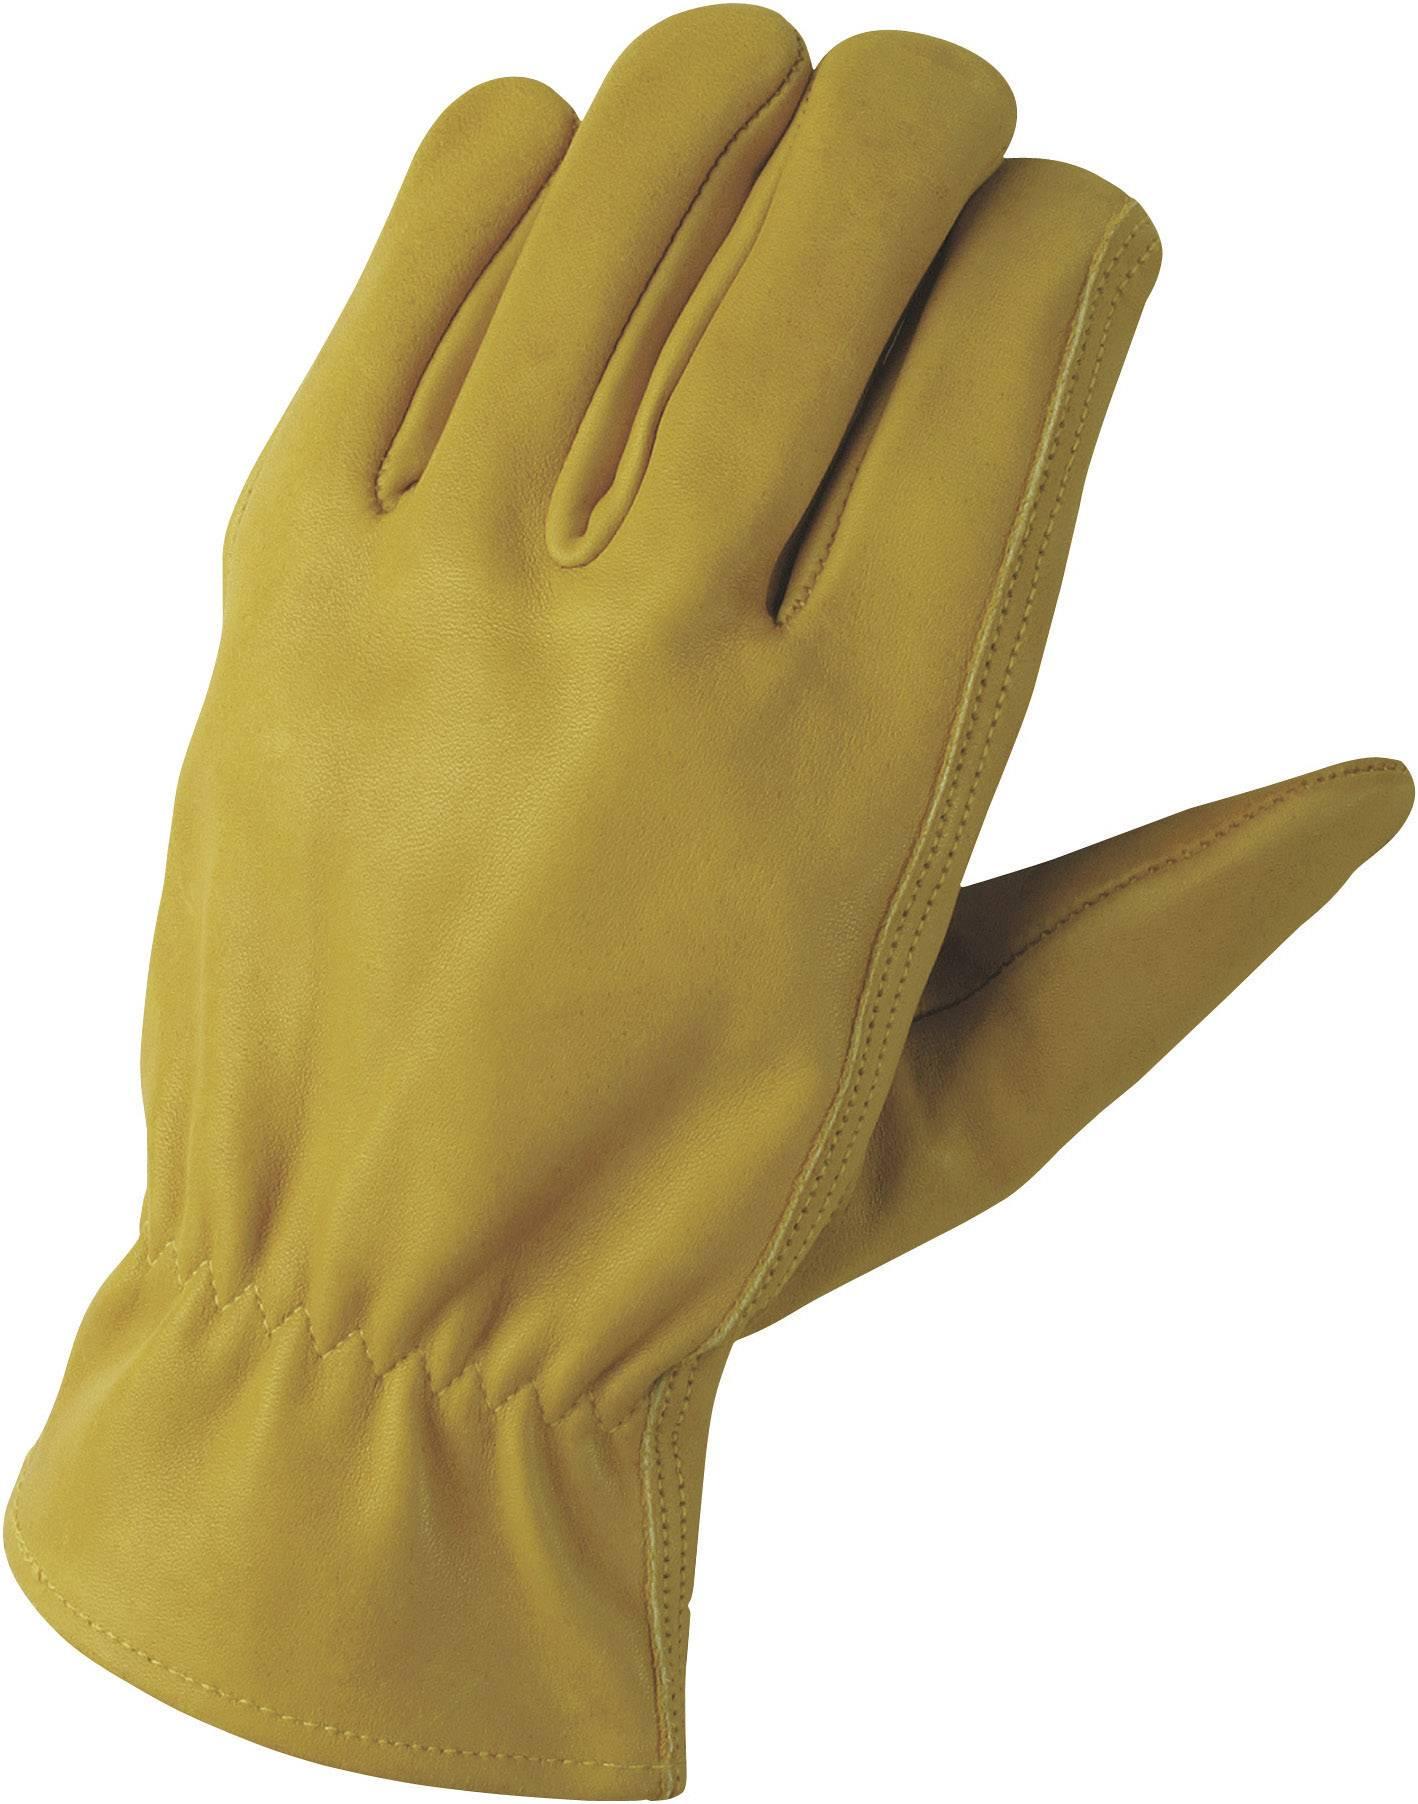 Montážne rukavice FerdyF. Conductor Garten 1610, velikost rukavic: 10, XL